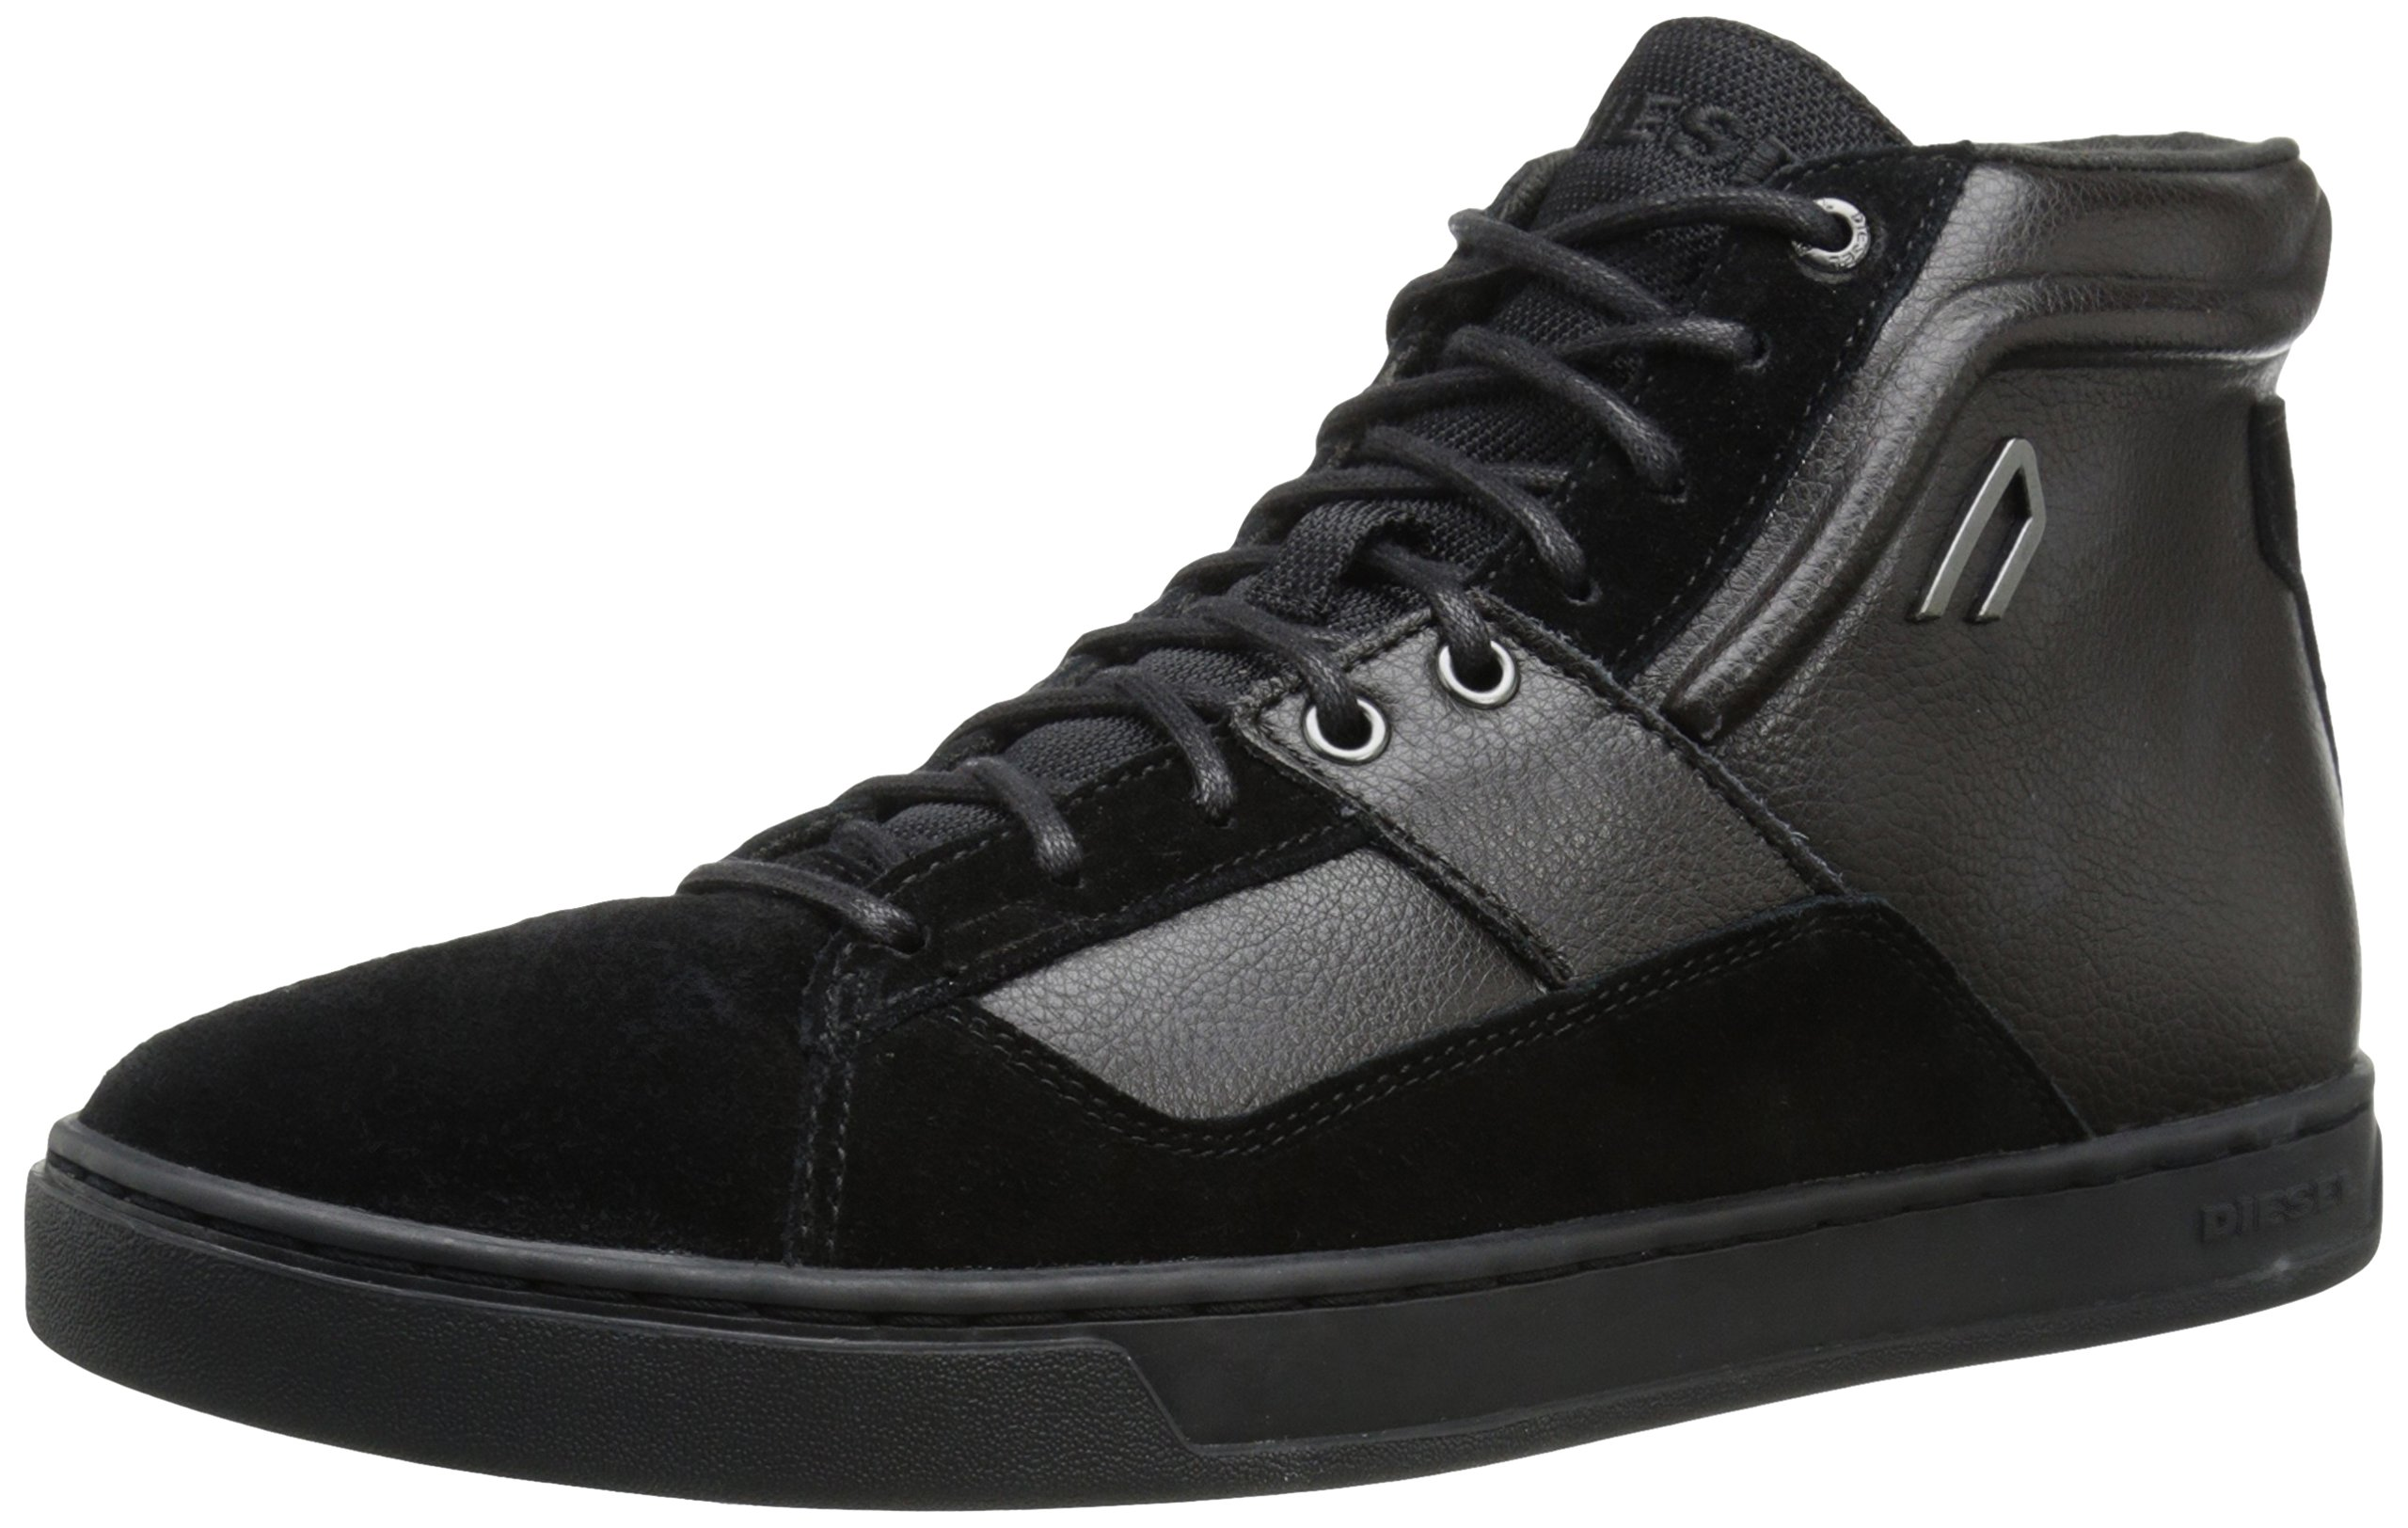 Diesel Men's Primmstal E-Prime Mid Fashion Sneaker, Black, 8.5 M US